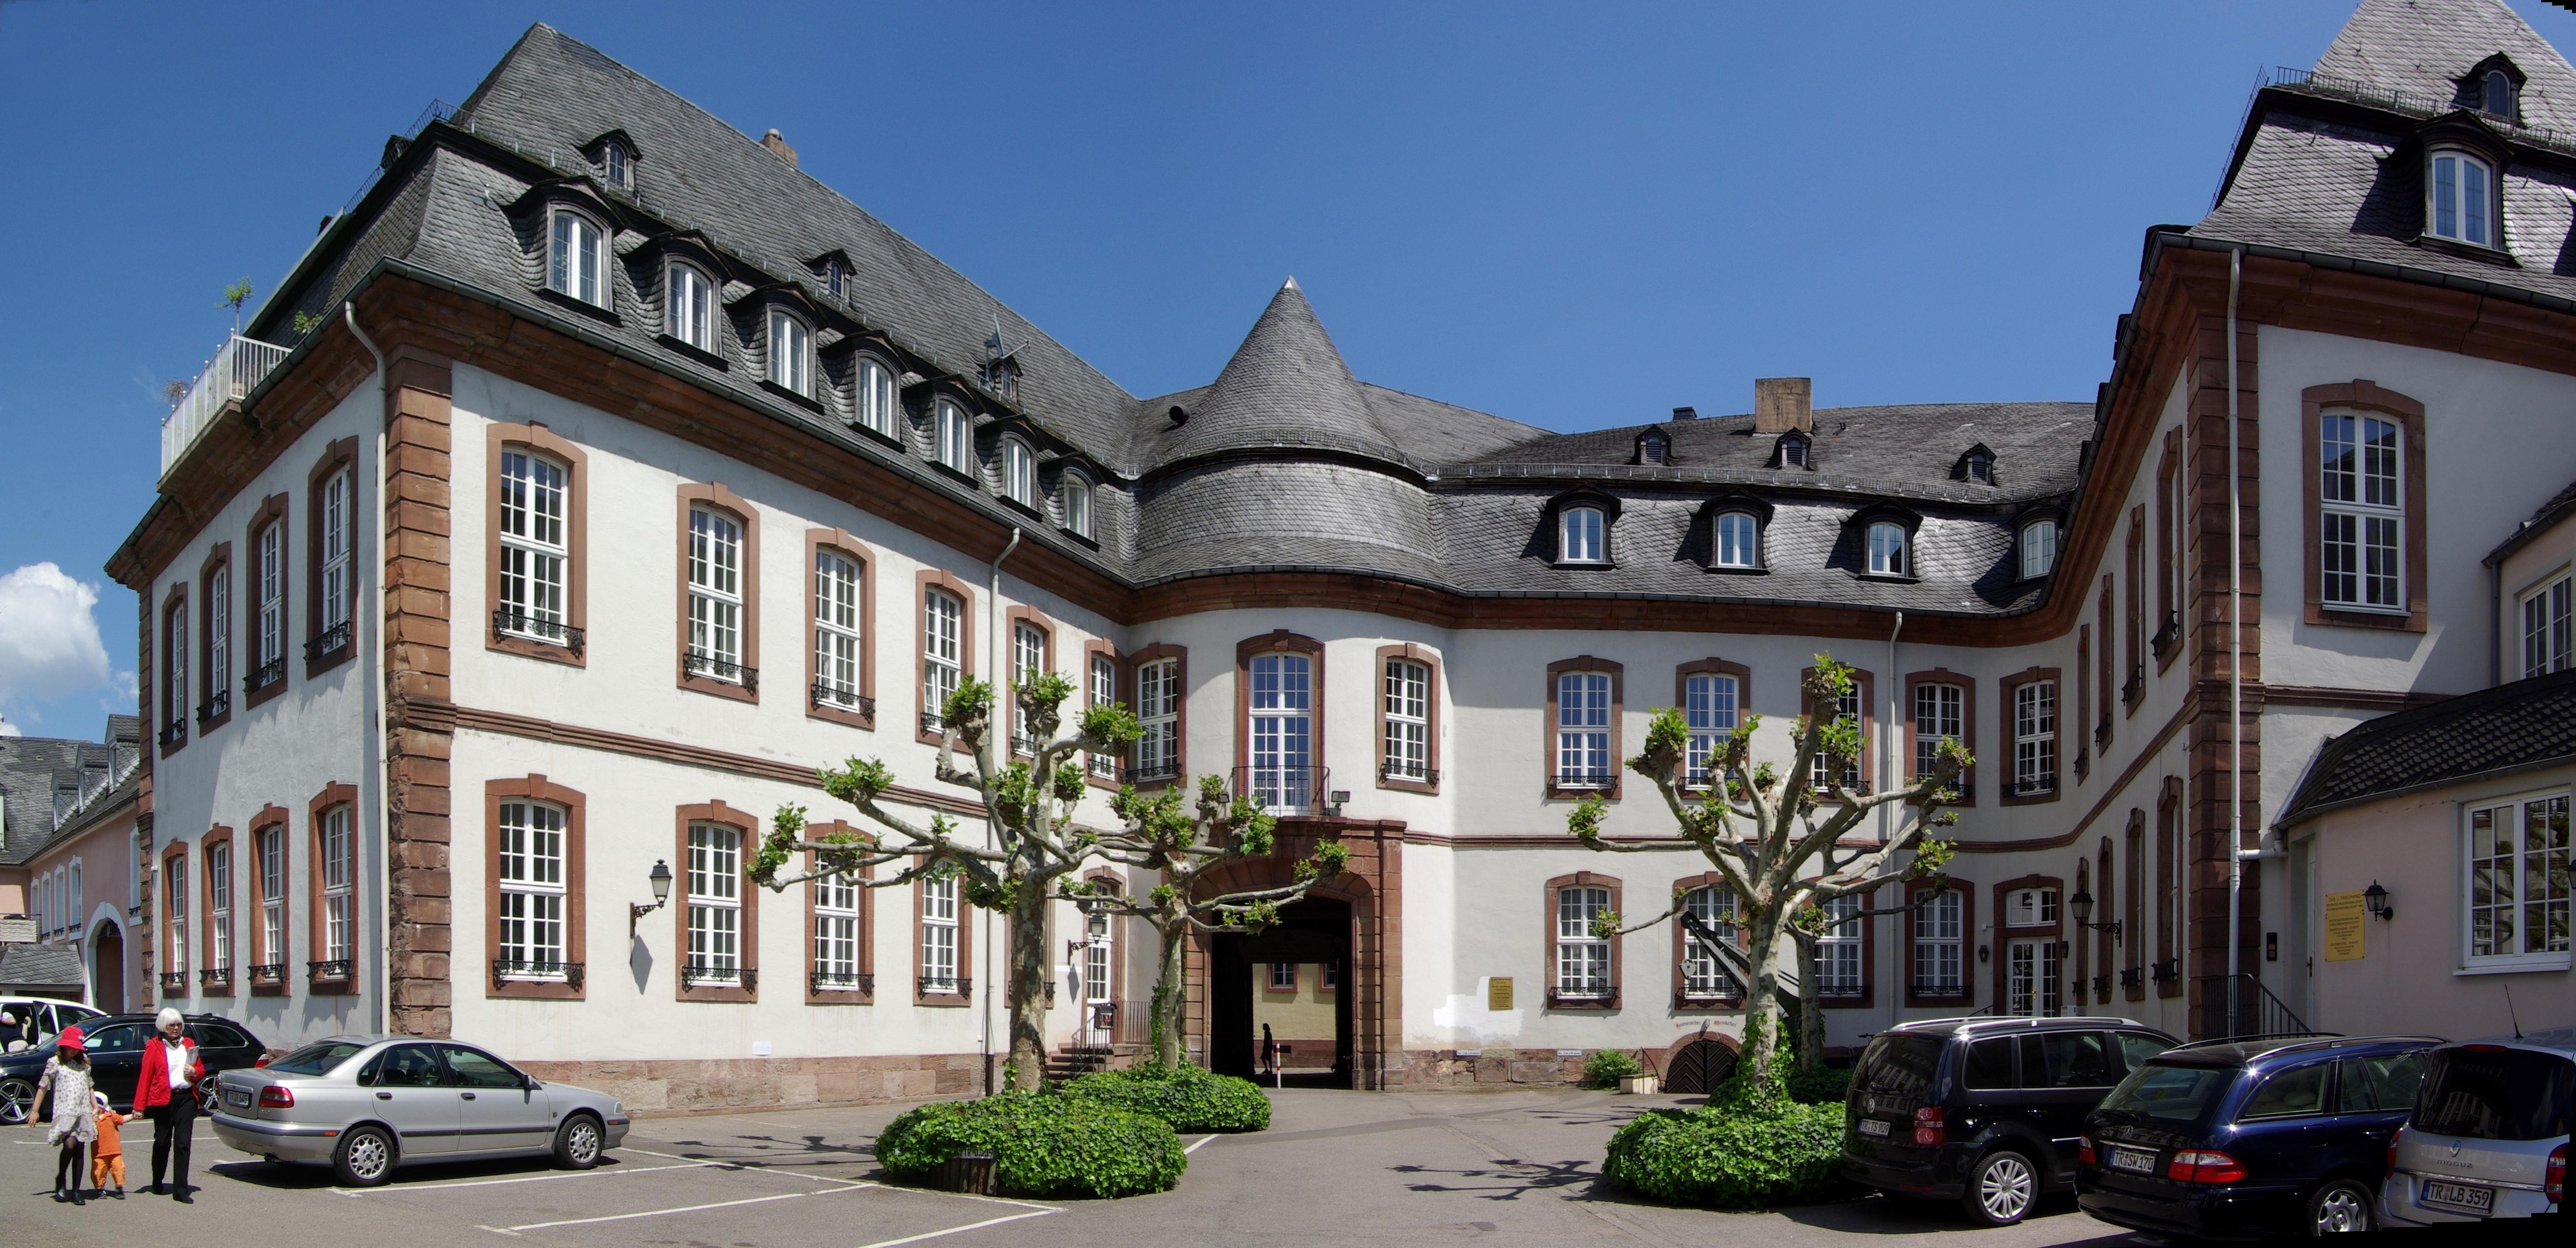 File trier palais kesselstadt wikimedia commons - Architekt trier ...